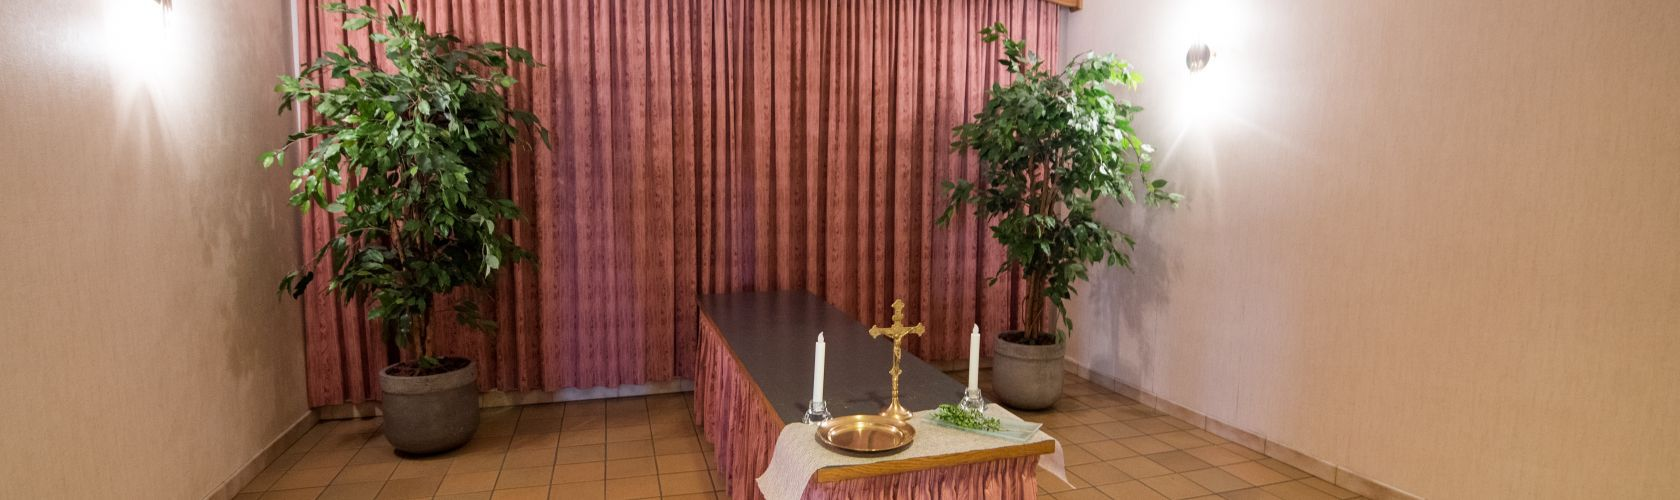 Salon funéraire FunéRADER à Herve